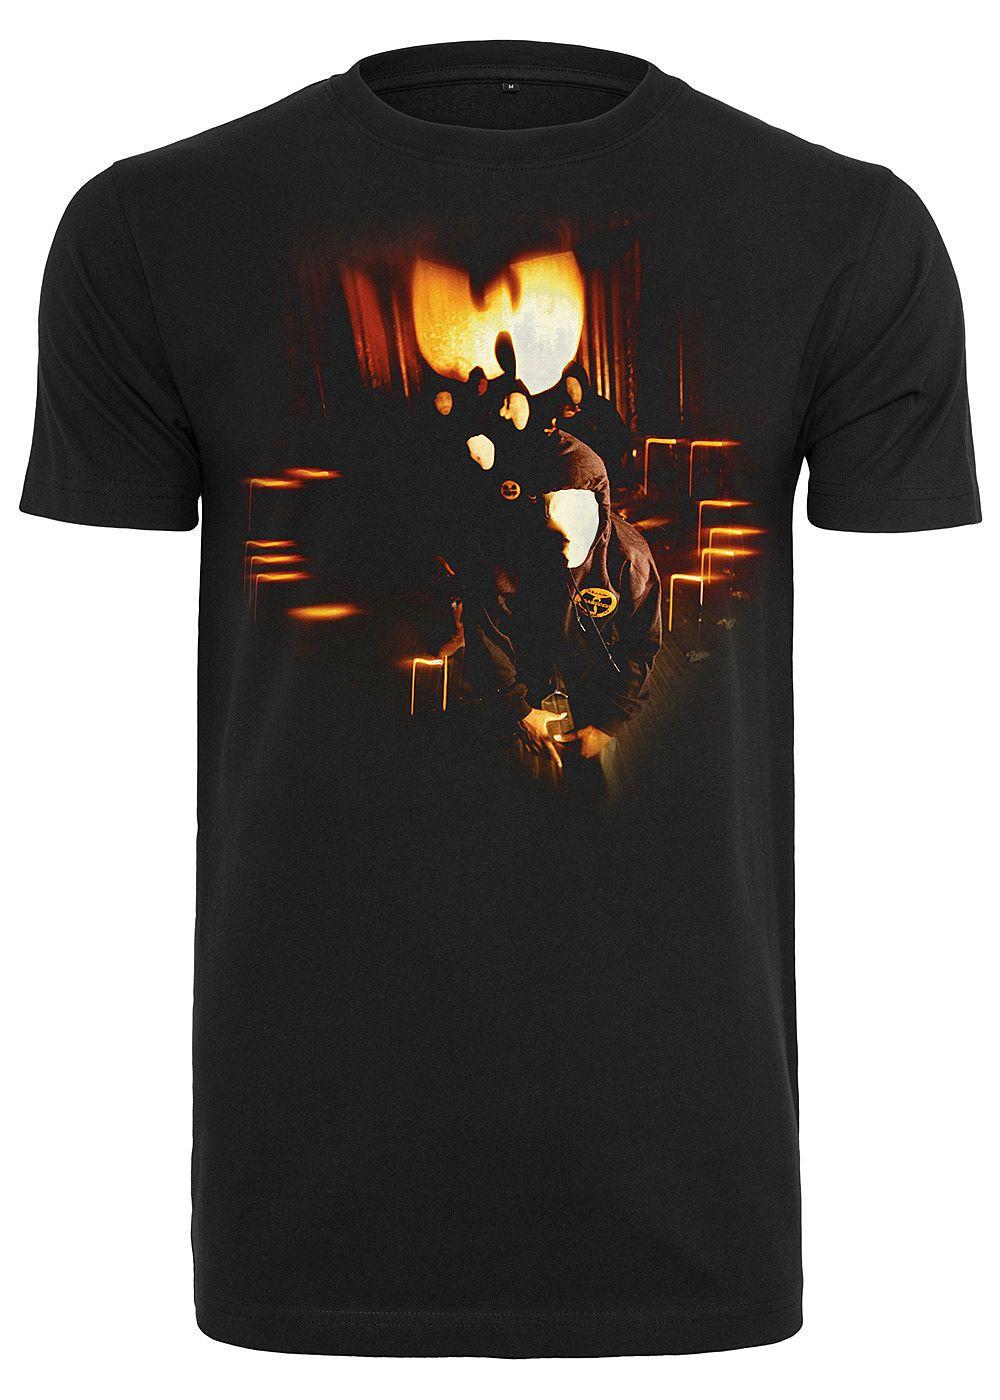 Wu Wear Tb Herren T Shirt Masks Print Schwarz Farbe Schwarz Größe Xs Wu Wear Herren T Shirt Shirts